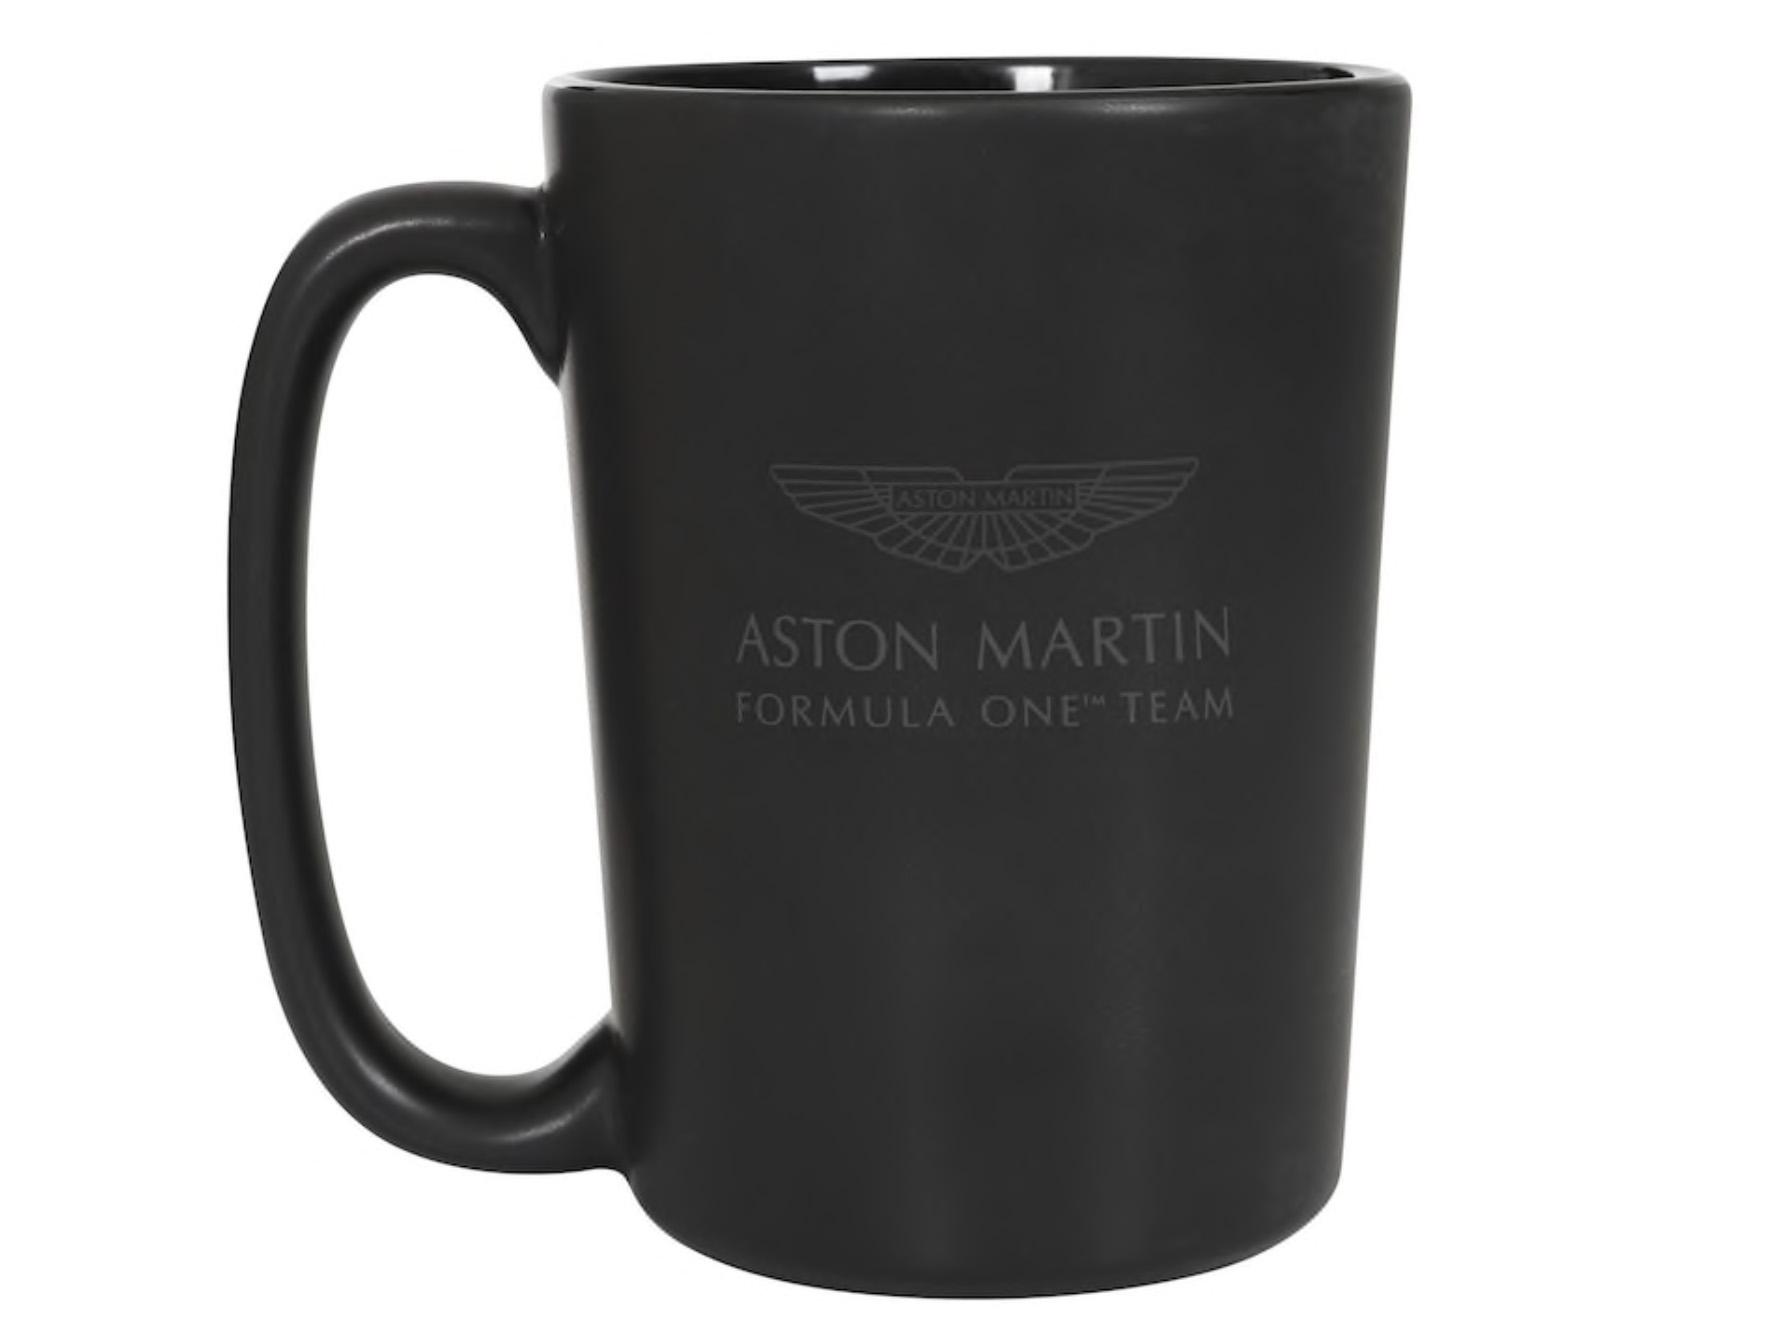 Aston Martin Launch Their 2021 Merchandise Collection Laptrinhx News